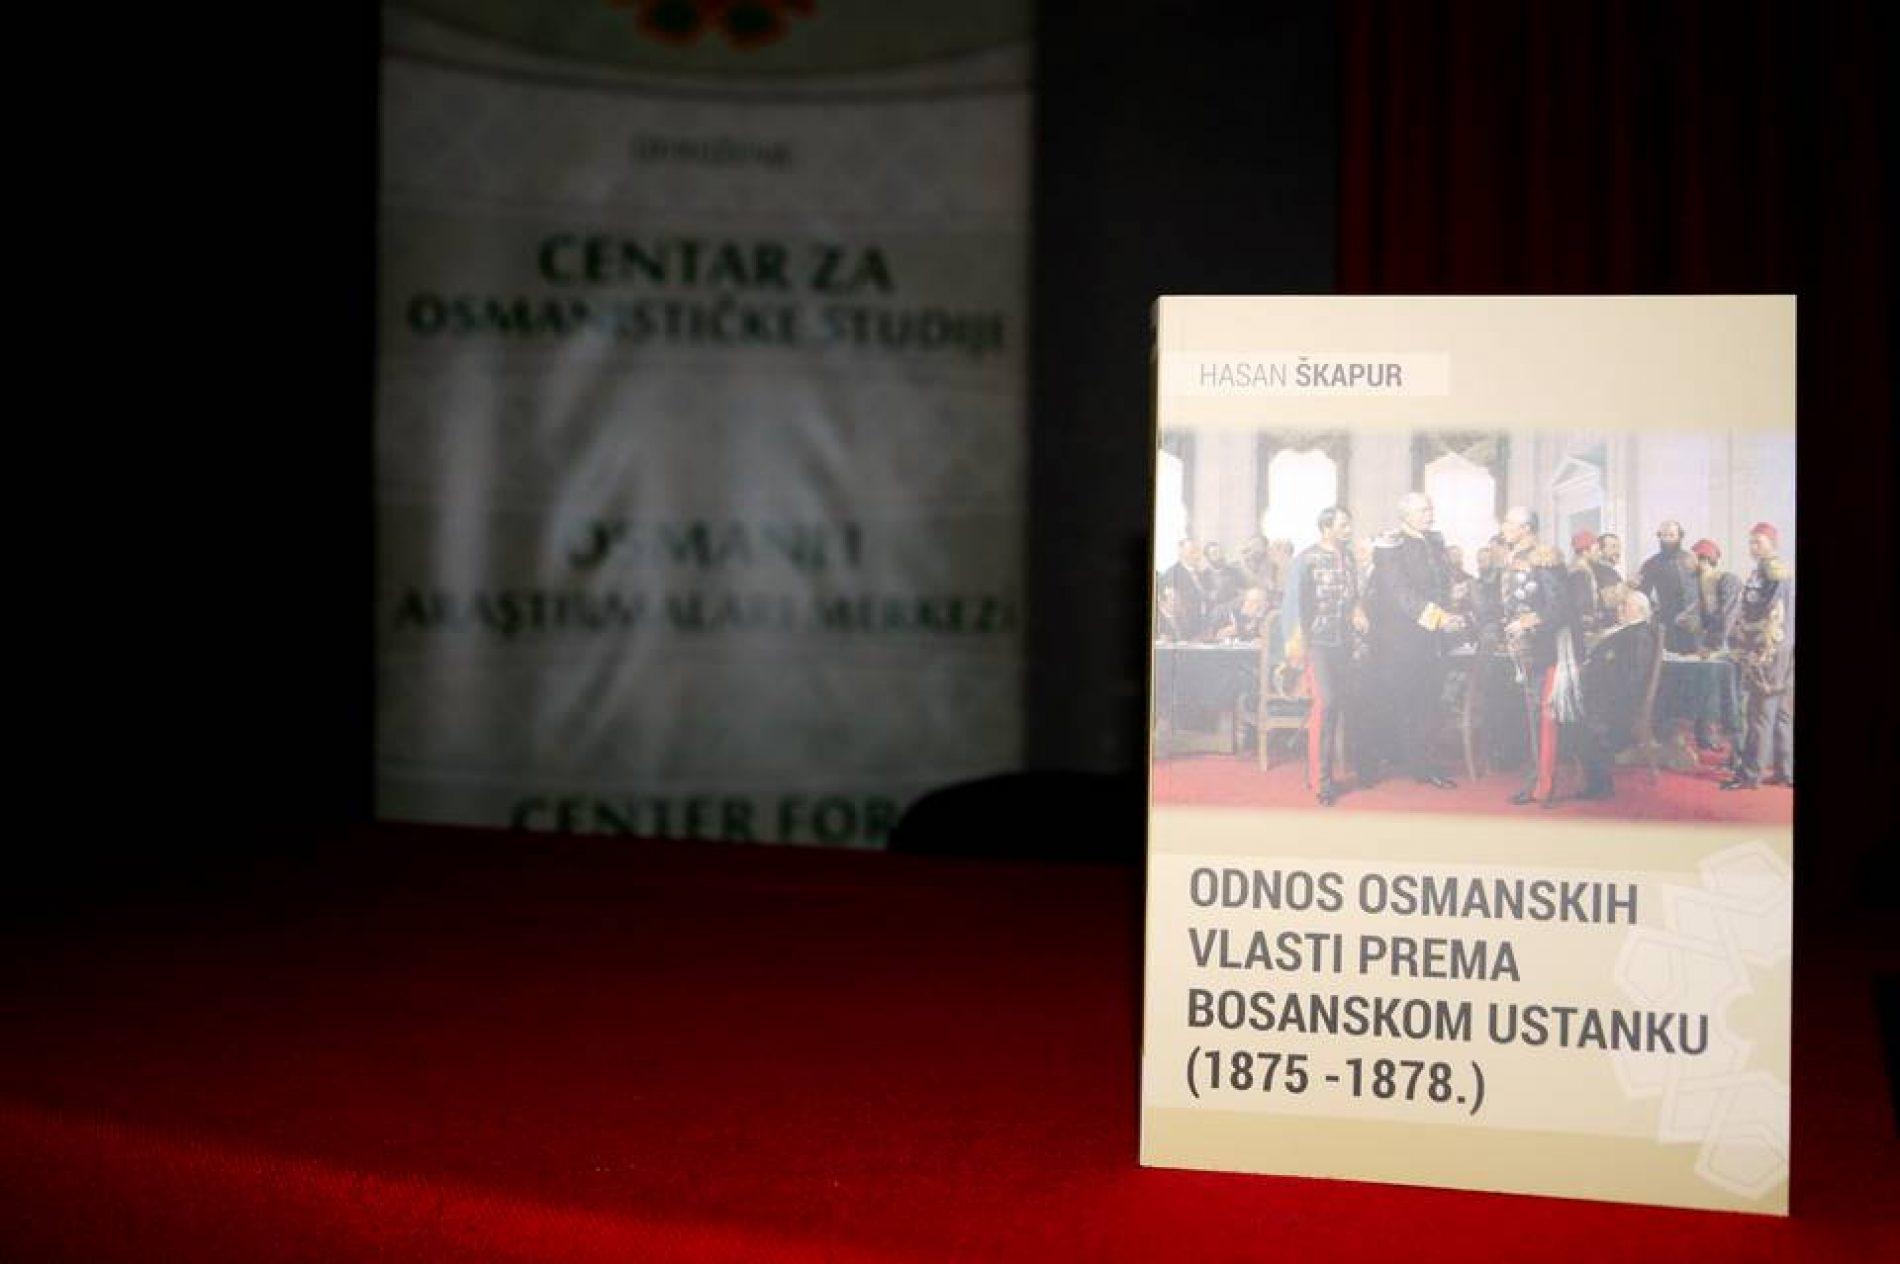 "Održana promocija knjige ""Odnos osmanskih vlasti prema Bosanskom ustanku 1875-1878"""